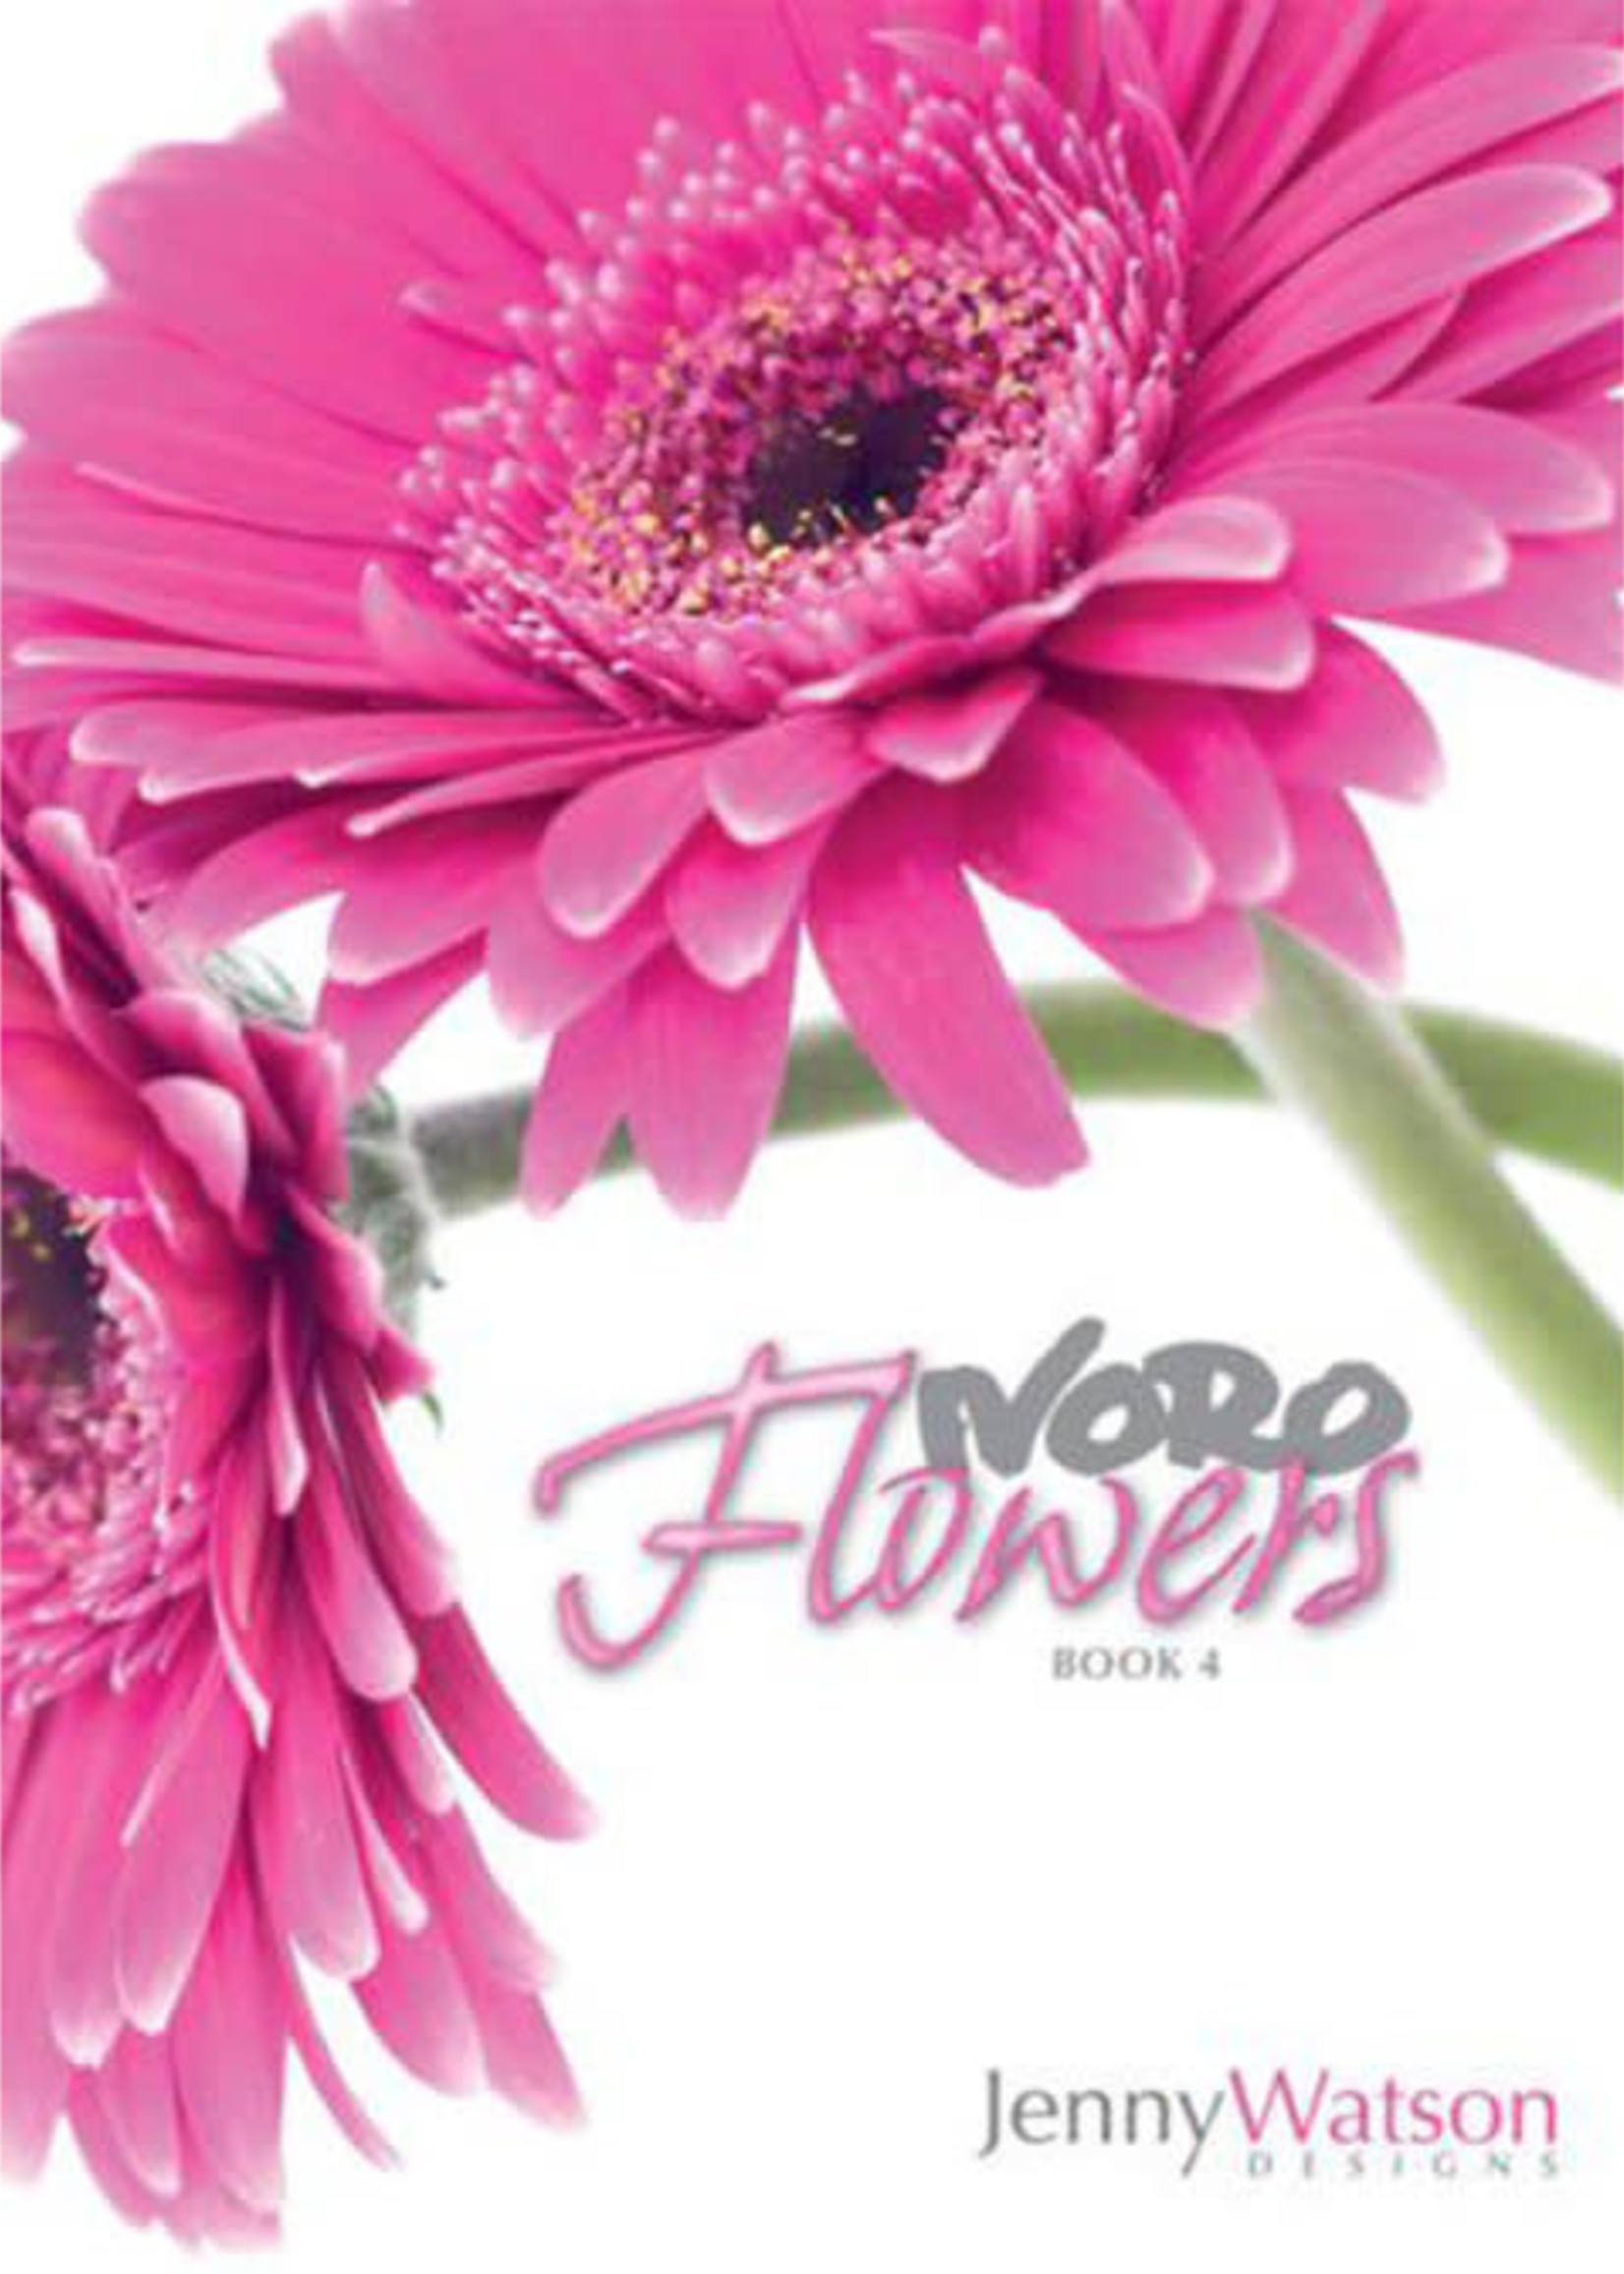 Noro Pattern Books Flowers Book 4 by Jenny Watson